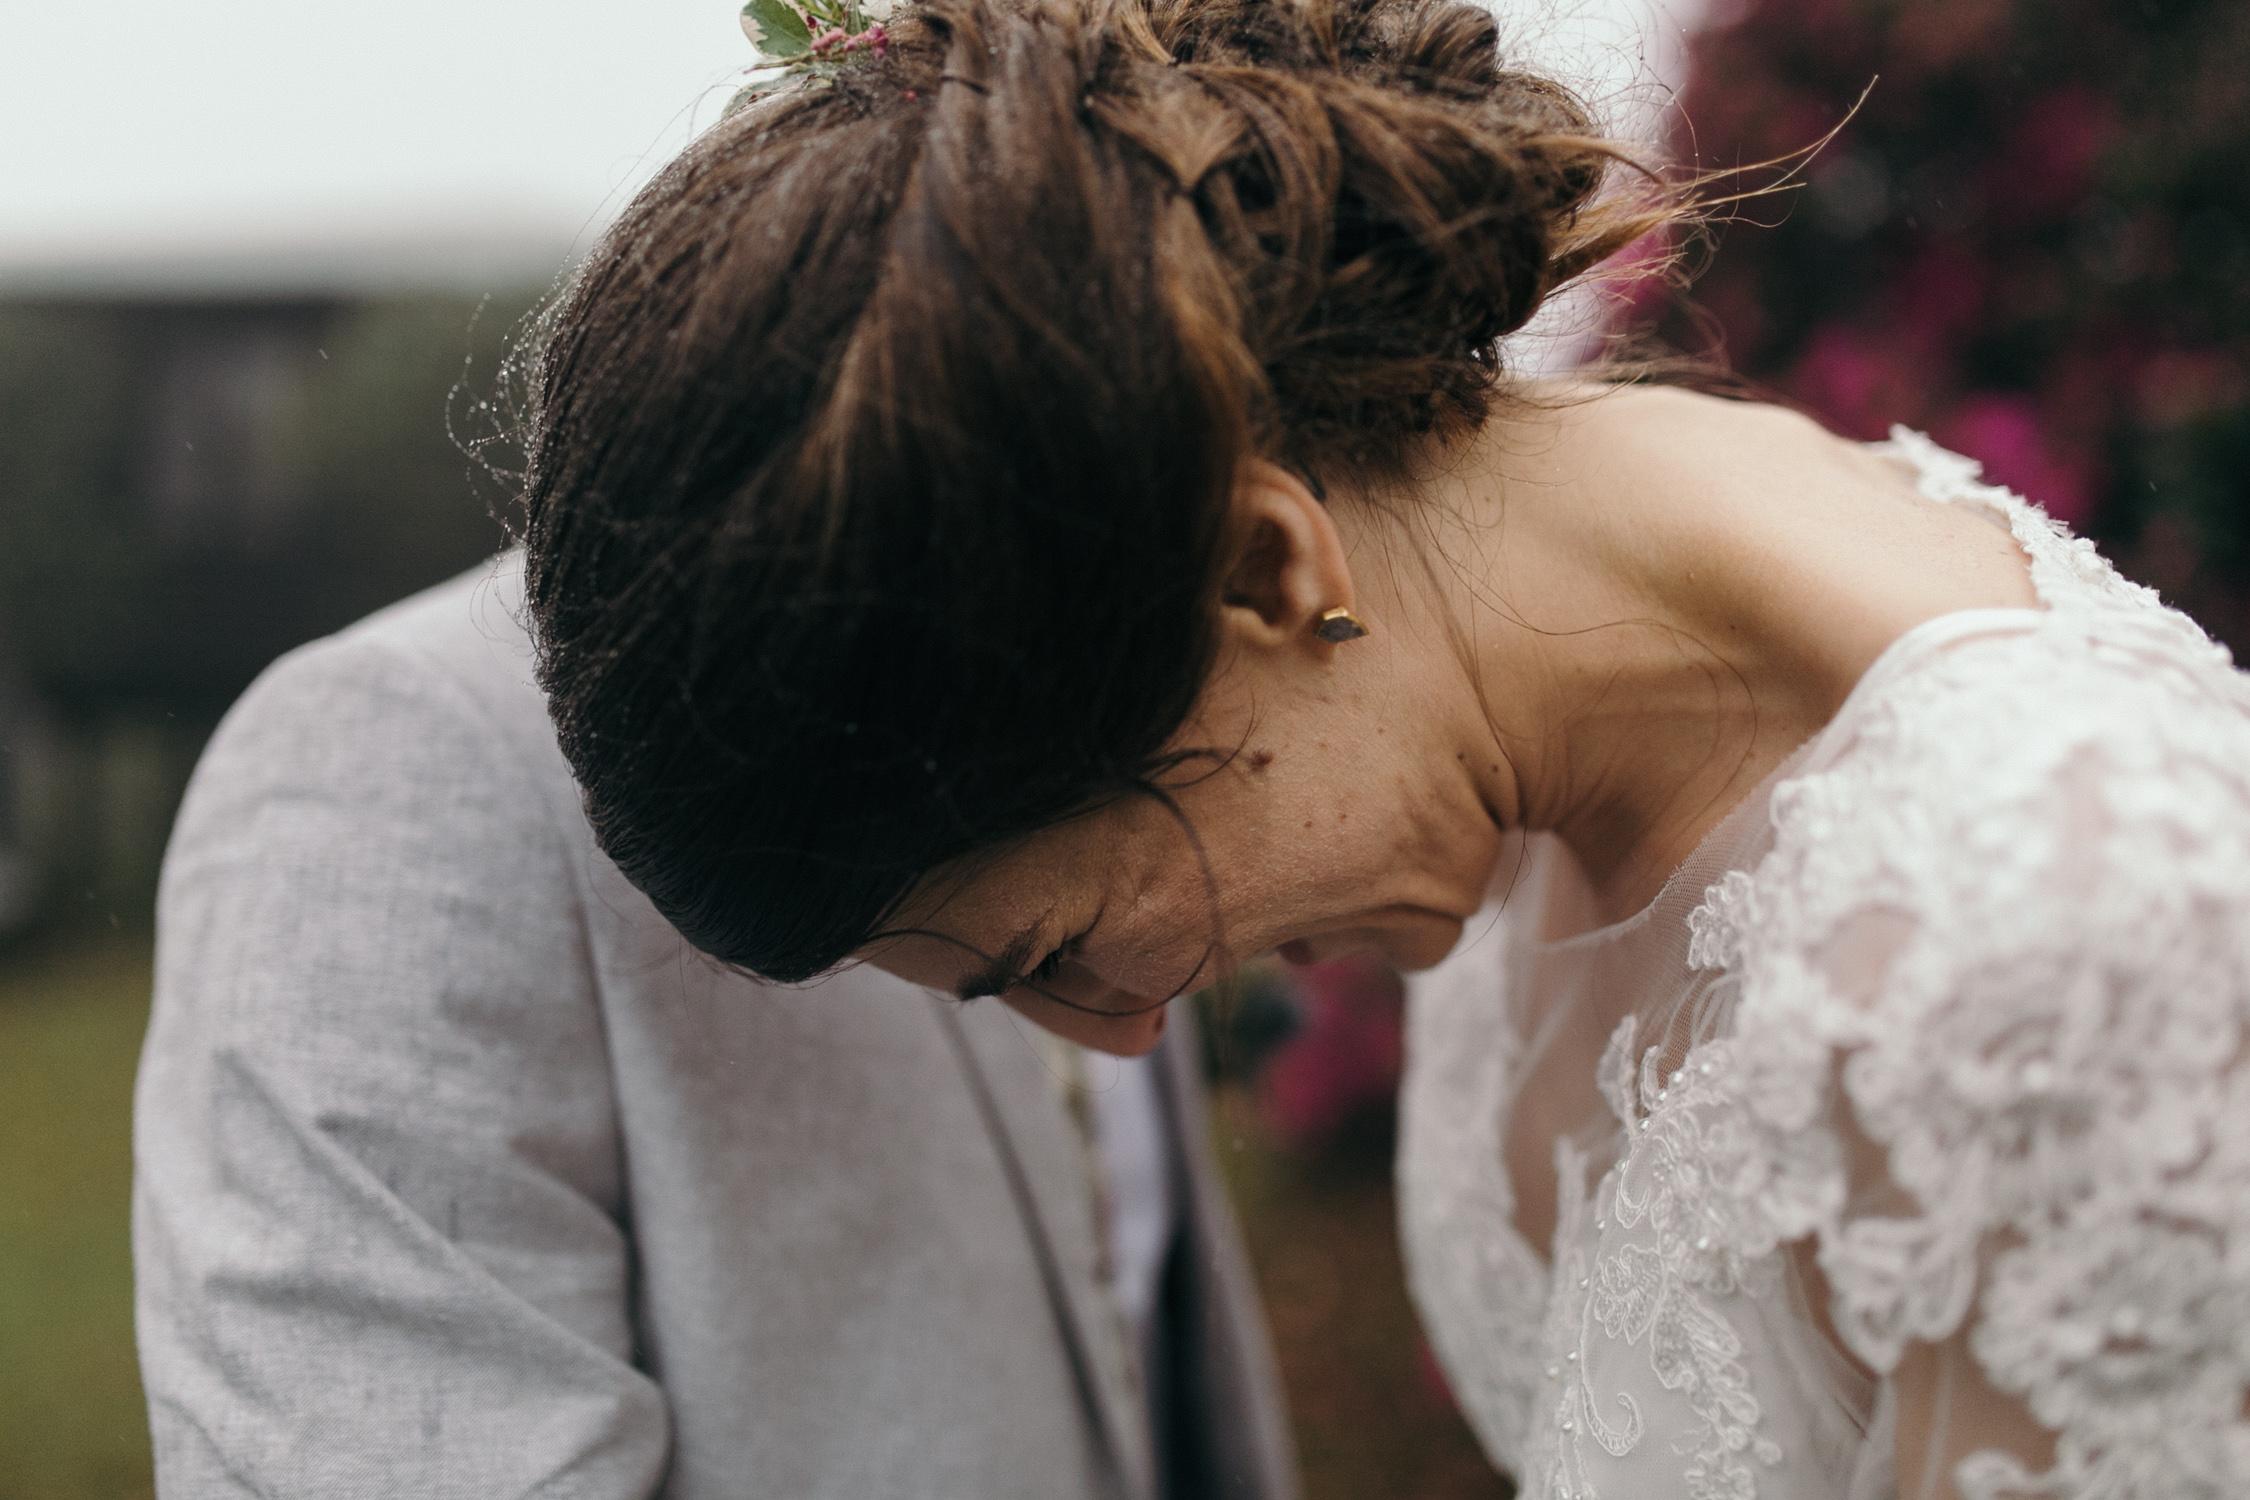 heisvisual-wedding-photographers-documentary-midlands-south-africa101.jpg